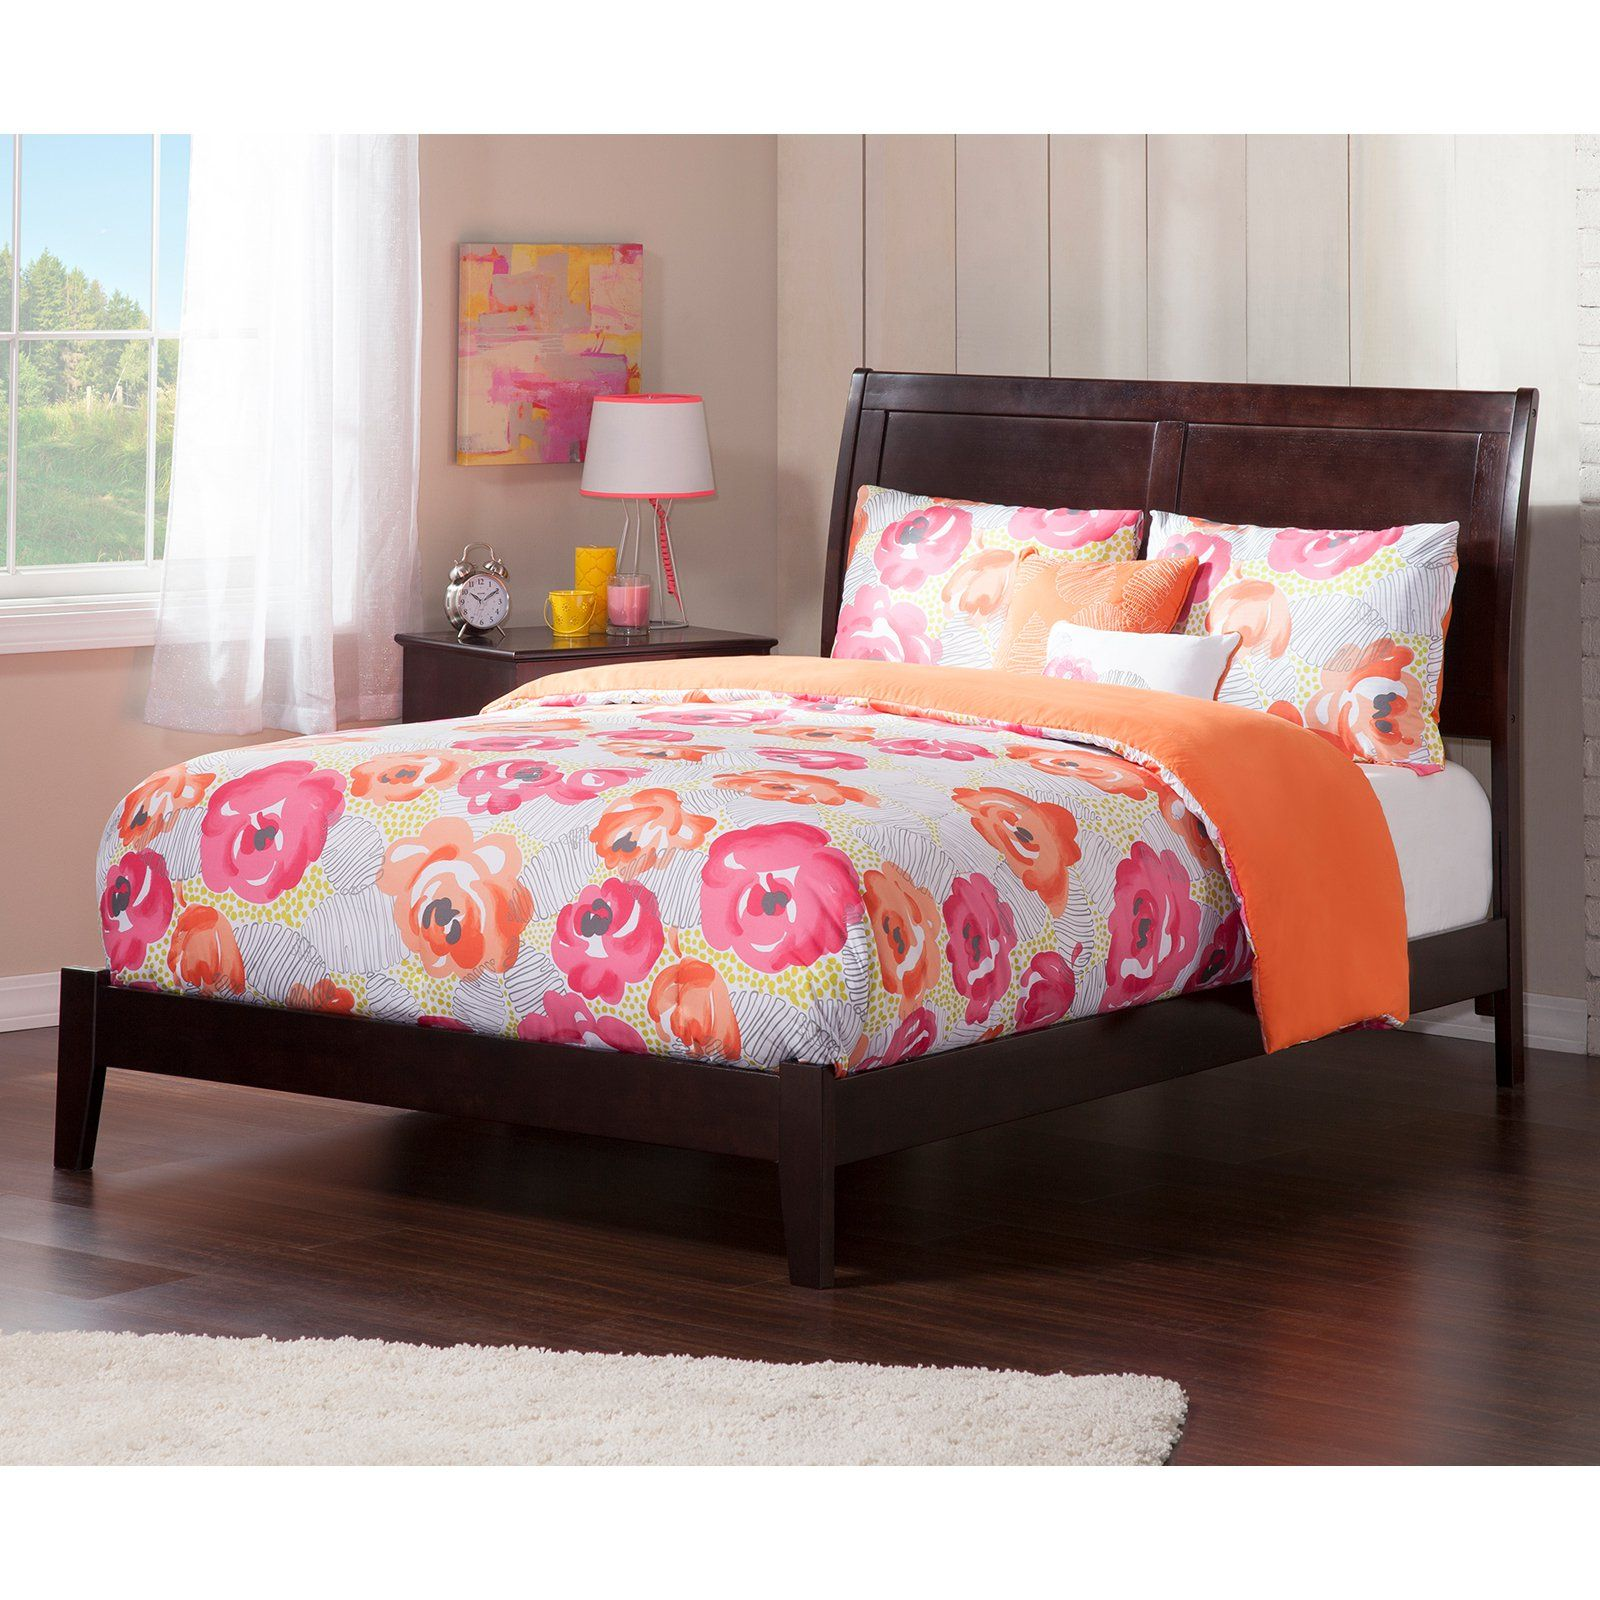 Atlantic Furniture Portland Traditional Bed Modern Bedroom